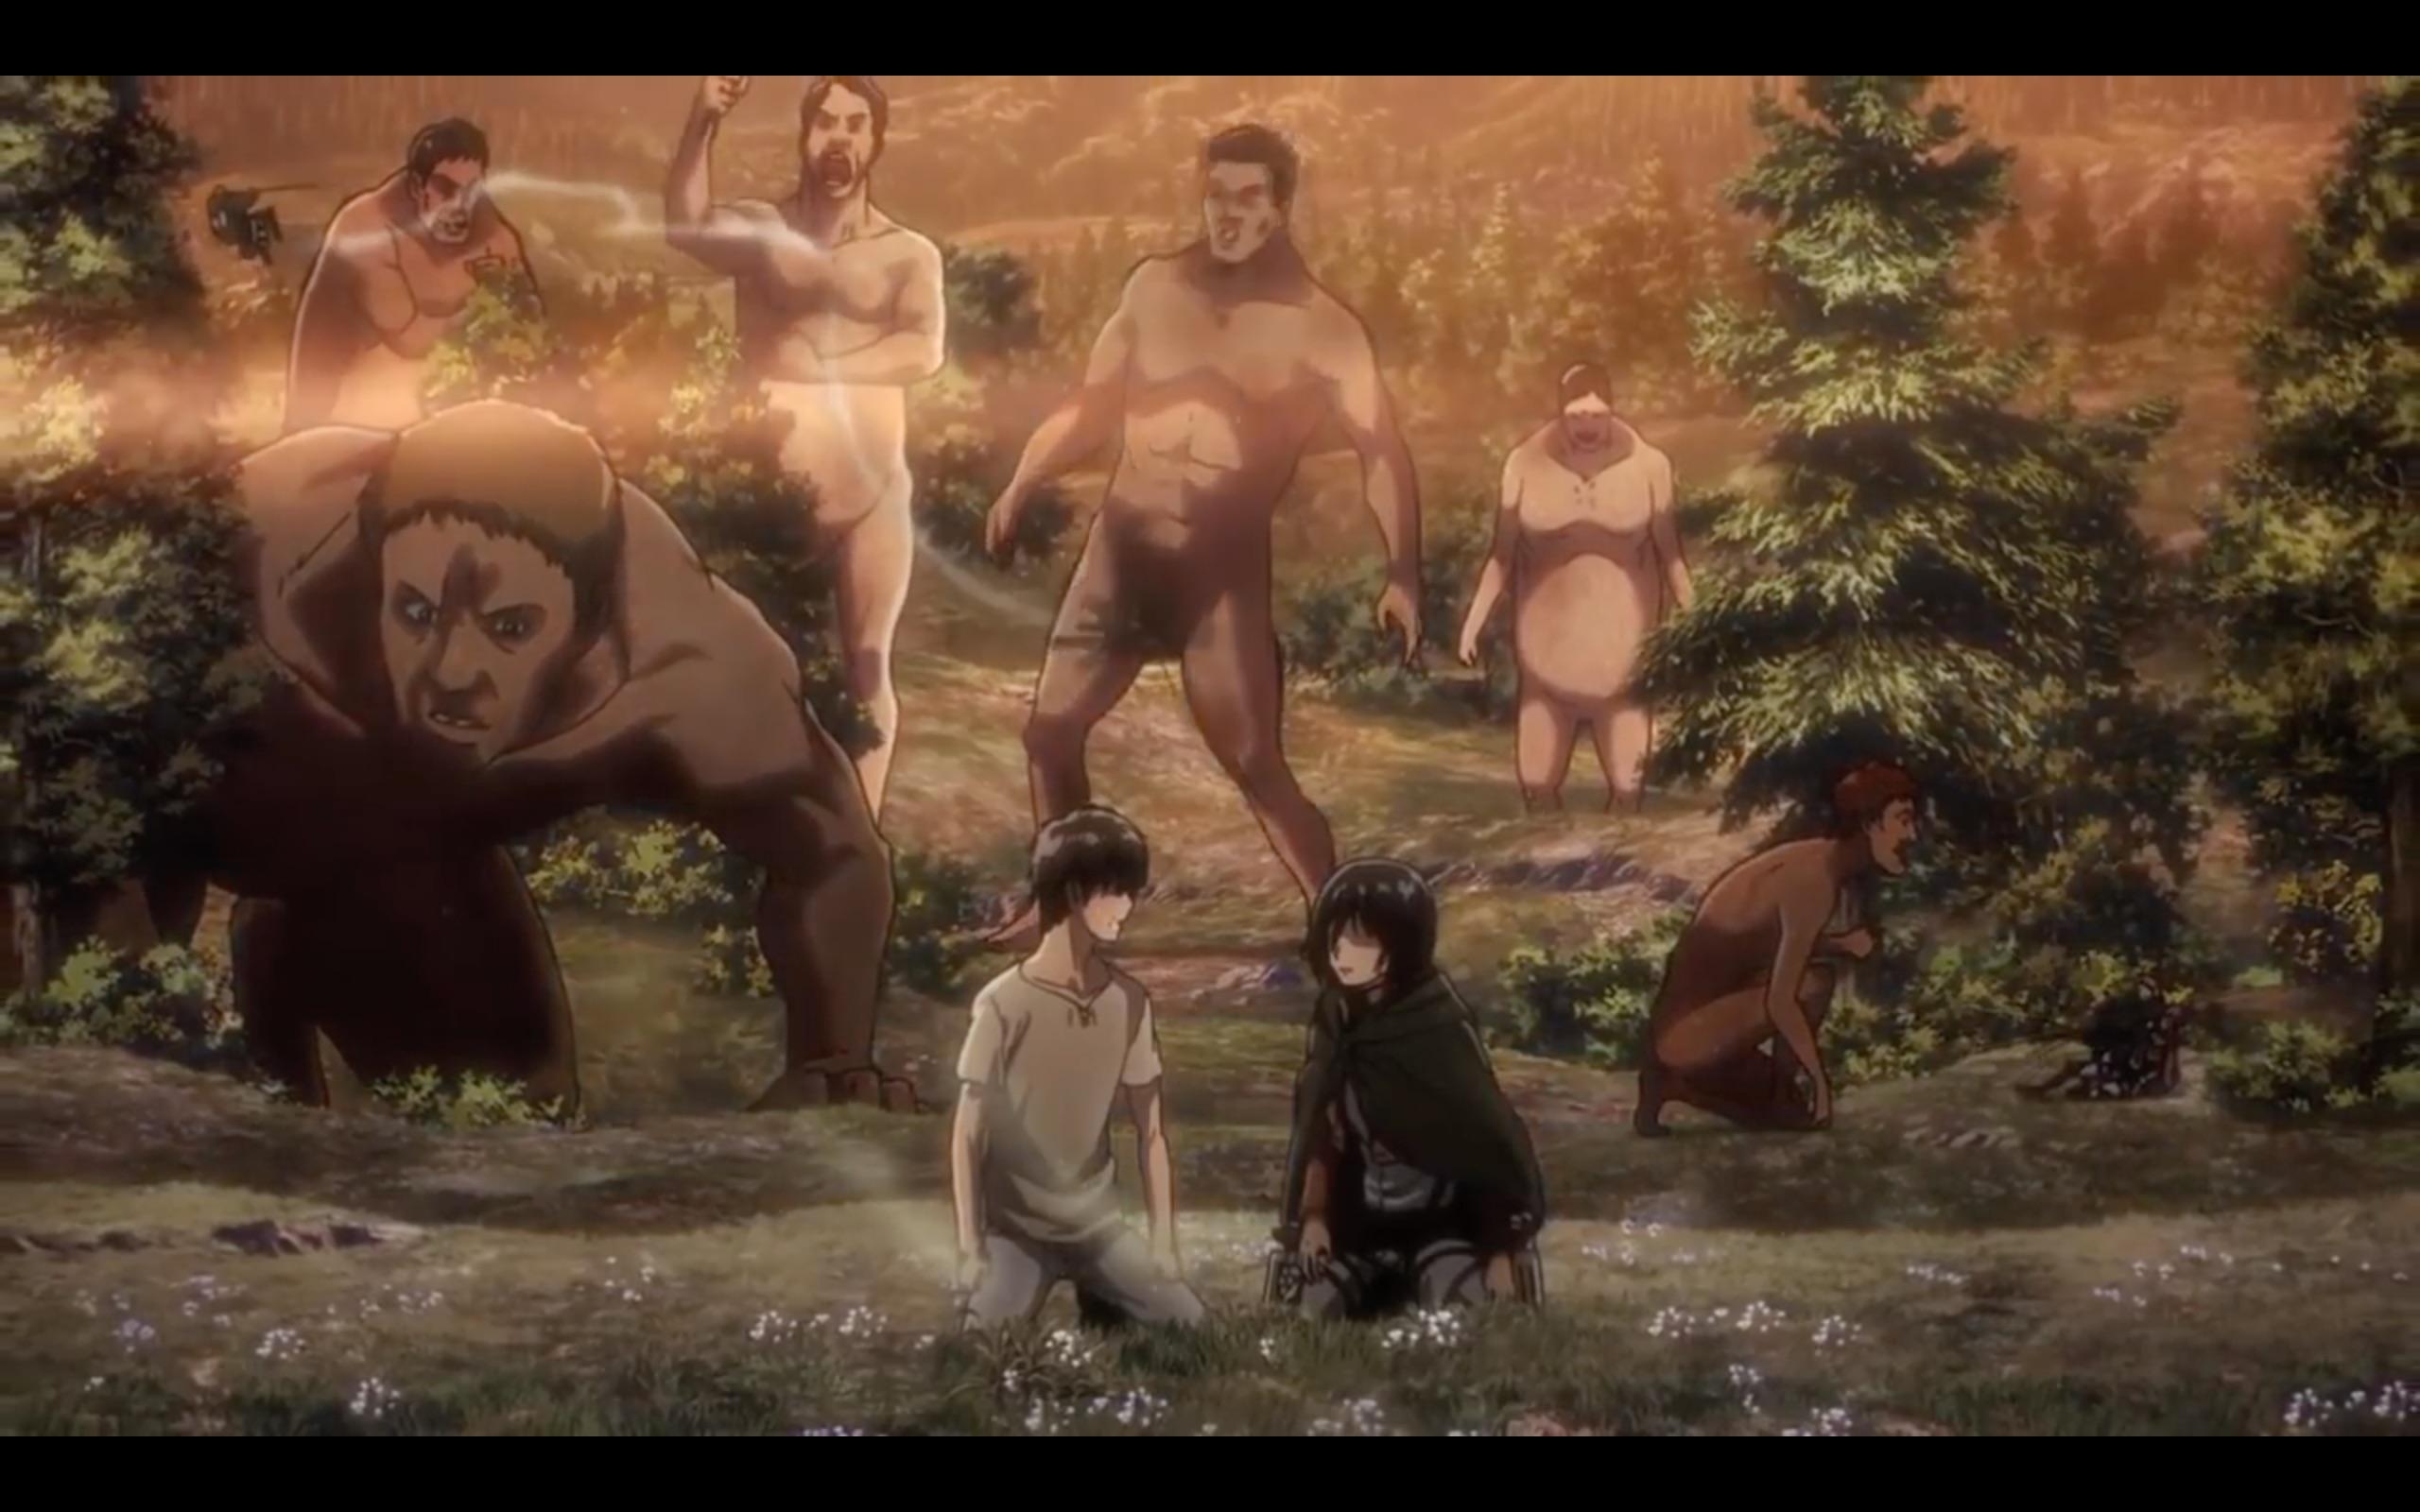 The Best Scenes in Attack on Titan